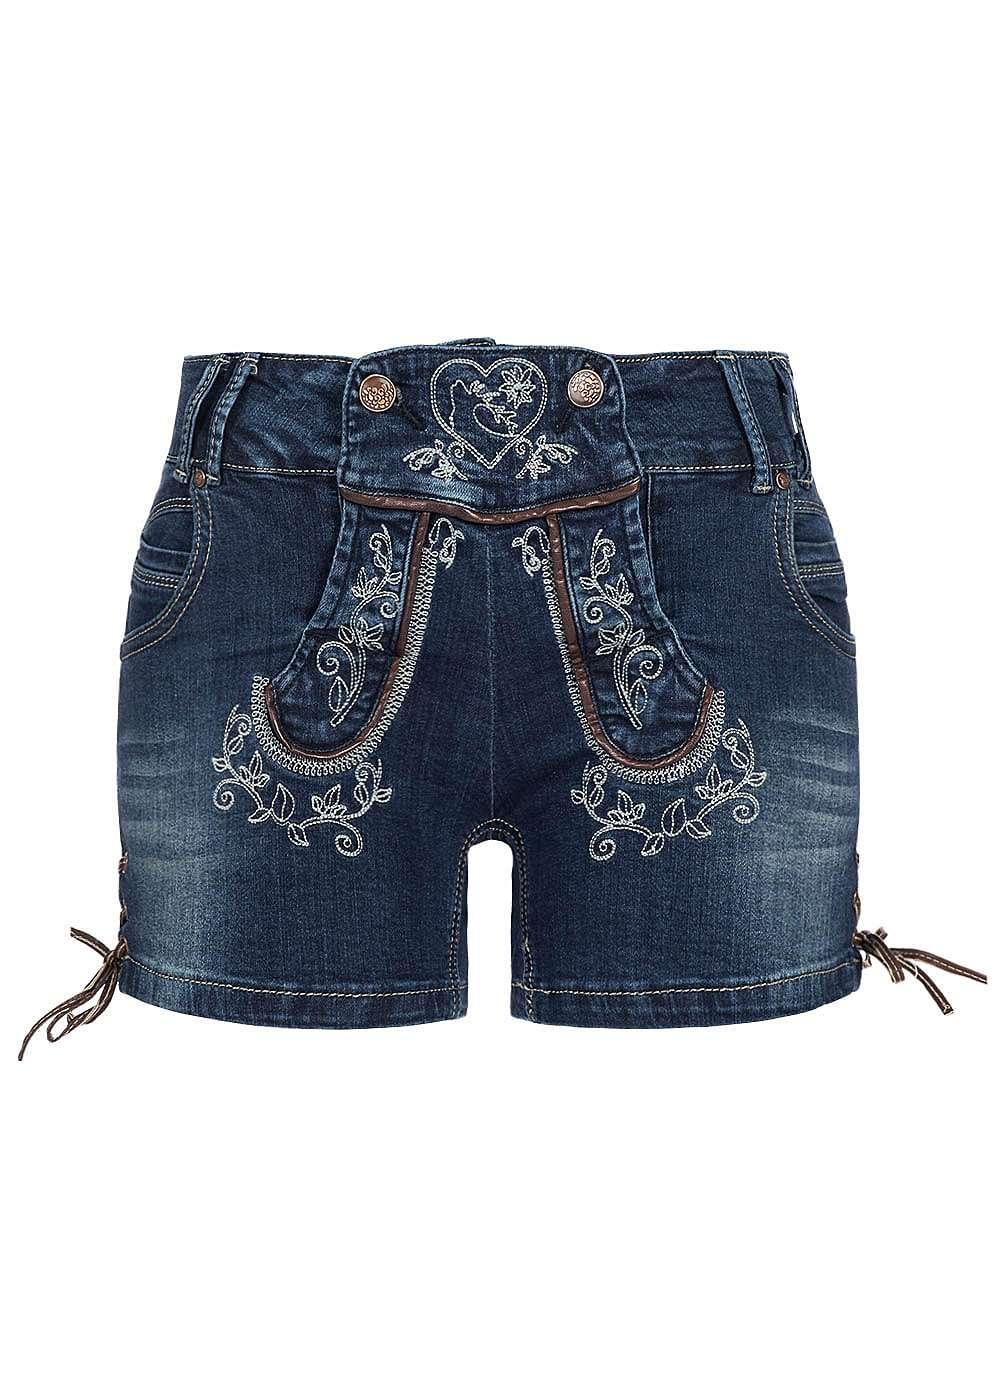 hailys damen jeans short mit stickerei 6 pocket style 4. Black Bedroom Furniture Sets. Home Design Ideas